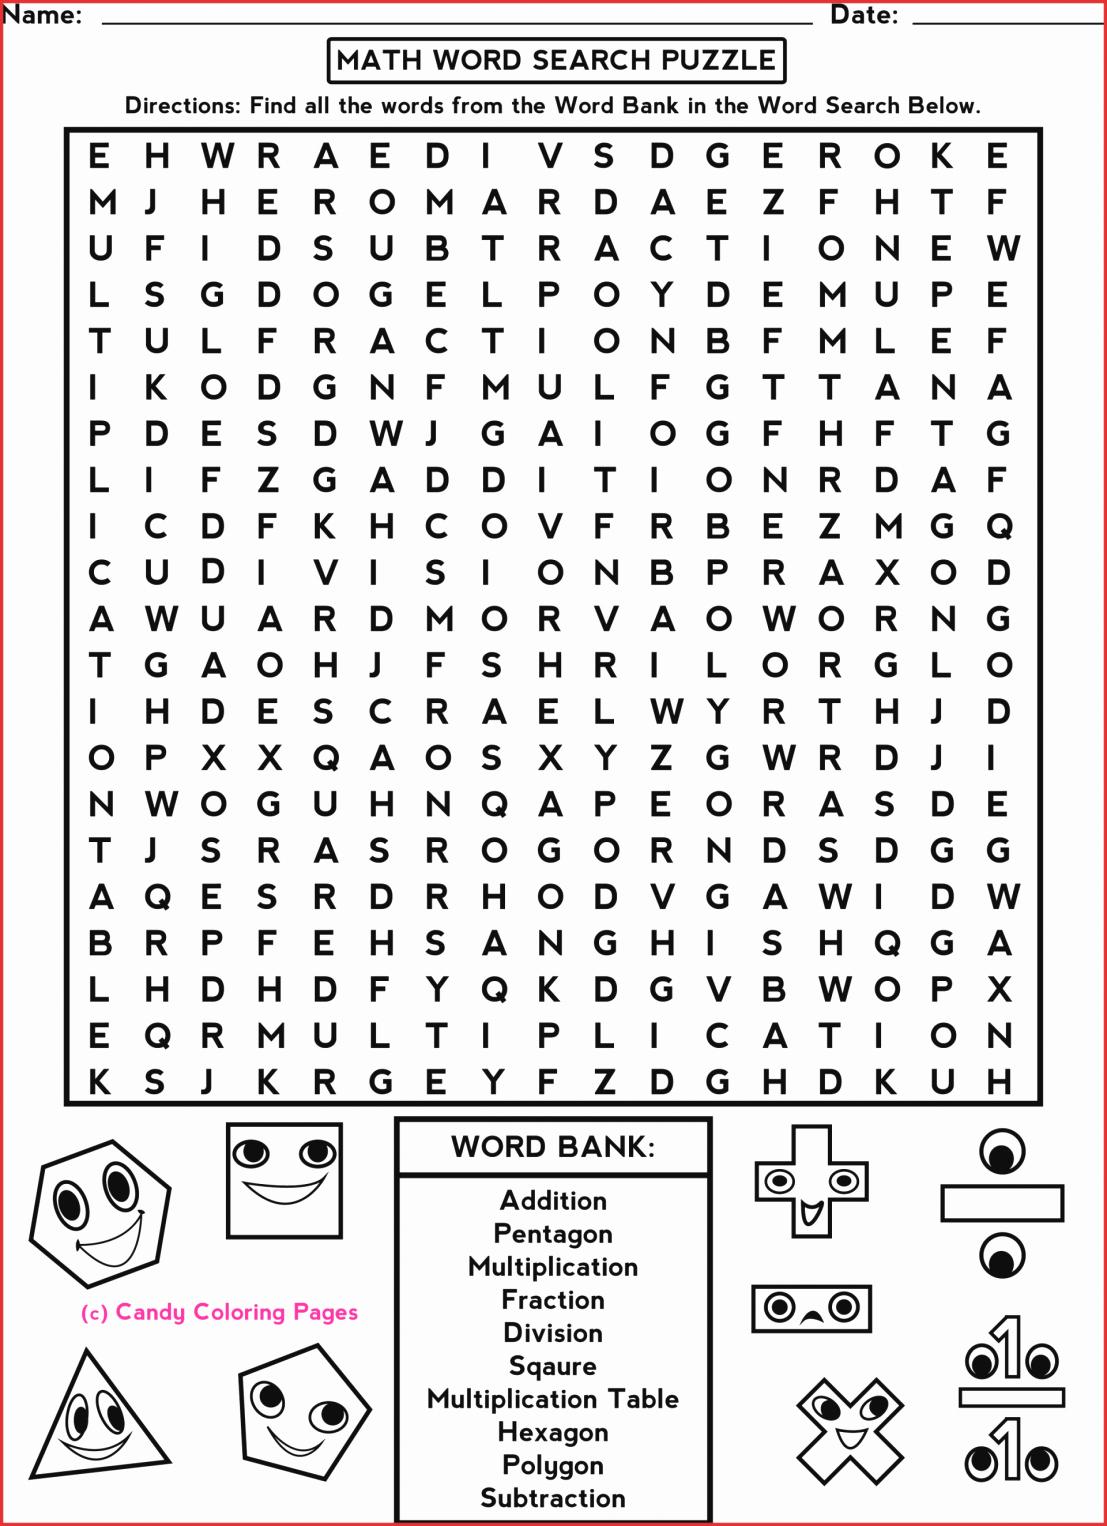 7Th Grade Crossword Puzzles Fresh 7Th Grade Math Word Search - Printable Crossword Puzzles For 7Th Graders